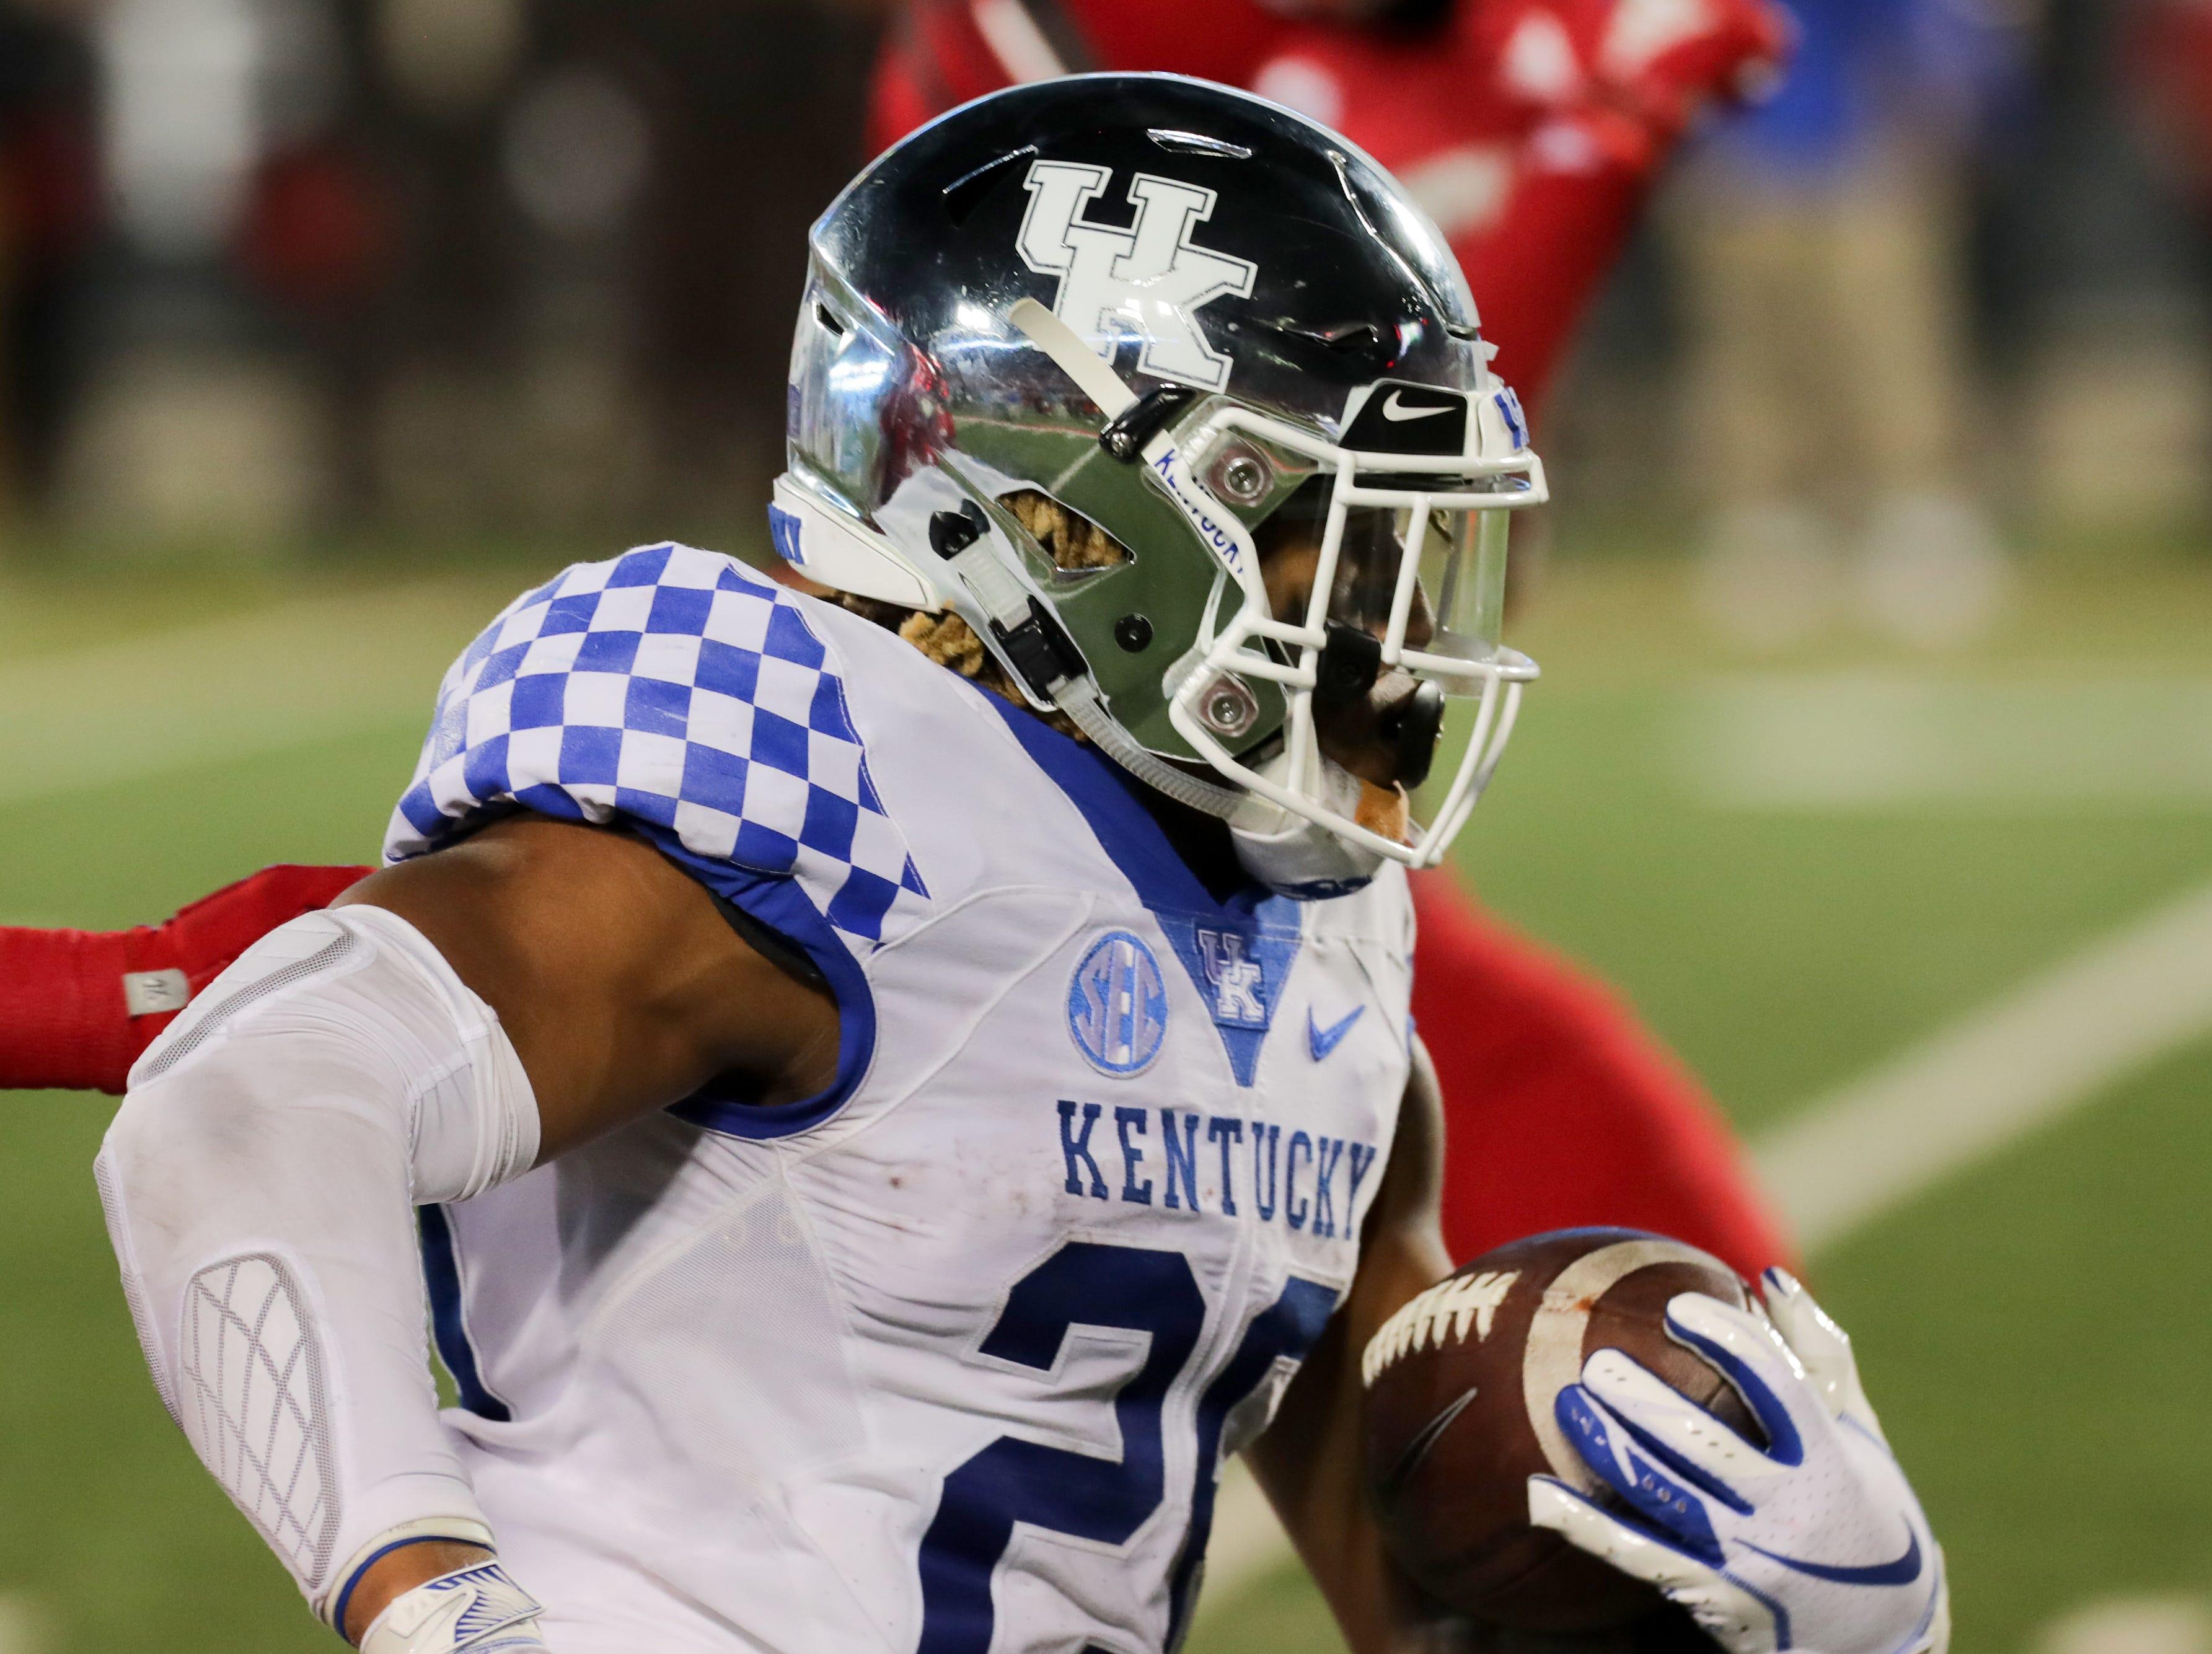 Kentucky's Benny Snell Jr. runs in a touchdown against Louisville.  Nov. 24, 2018